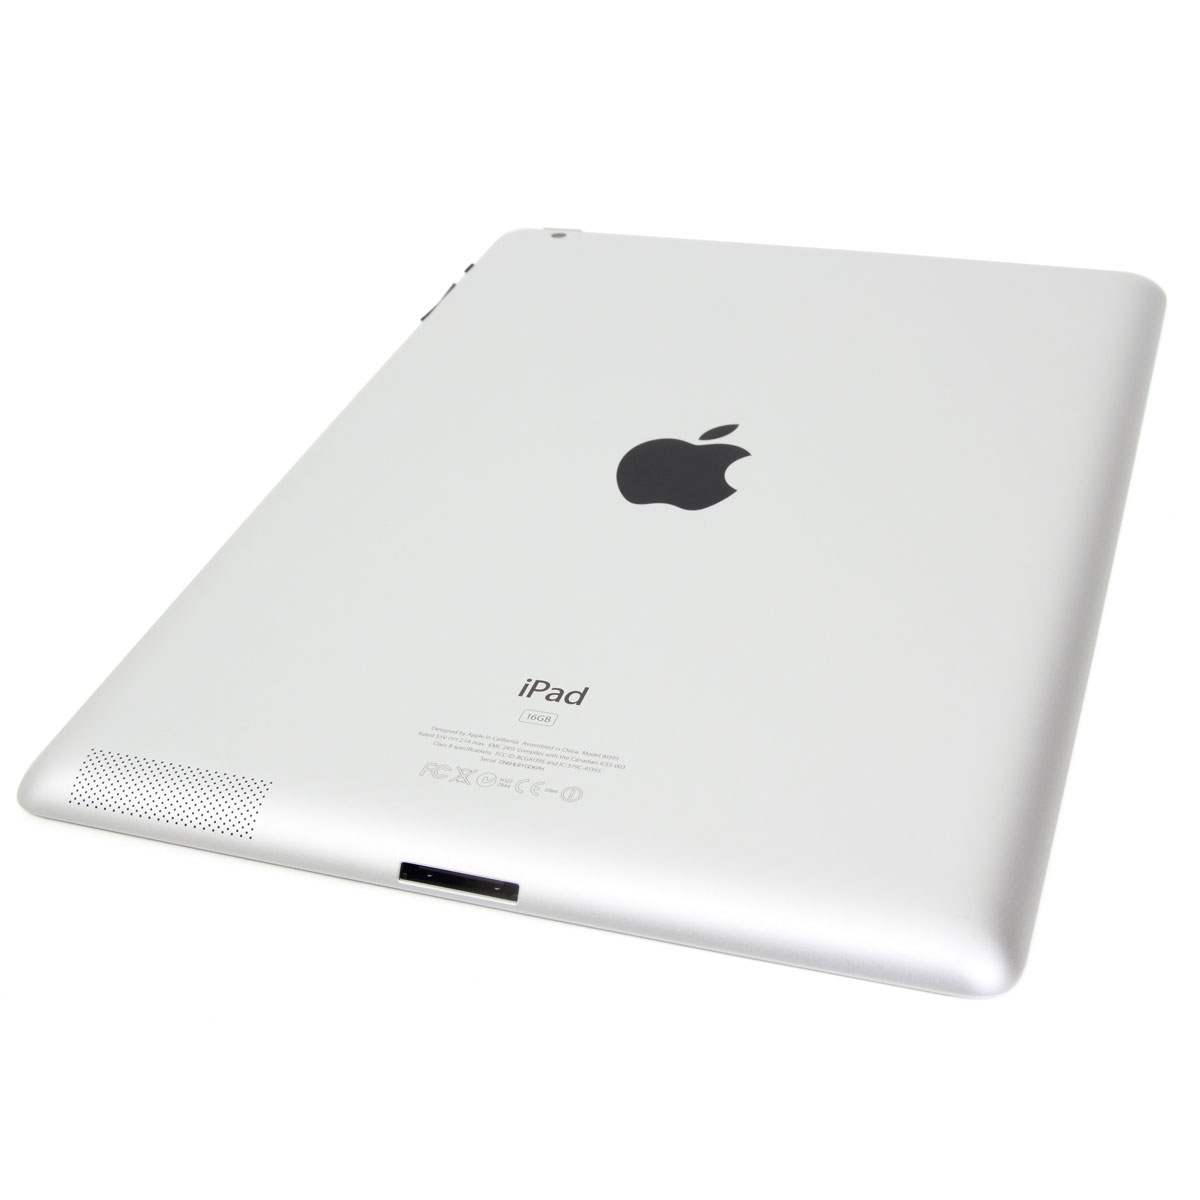 apple ipad 2 wi fi 16 go blanc tablette tactile apple. Black Bedroom Furniture Sets. Home Design Ideas